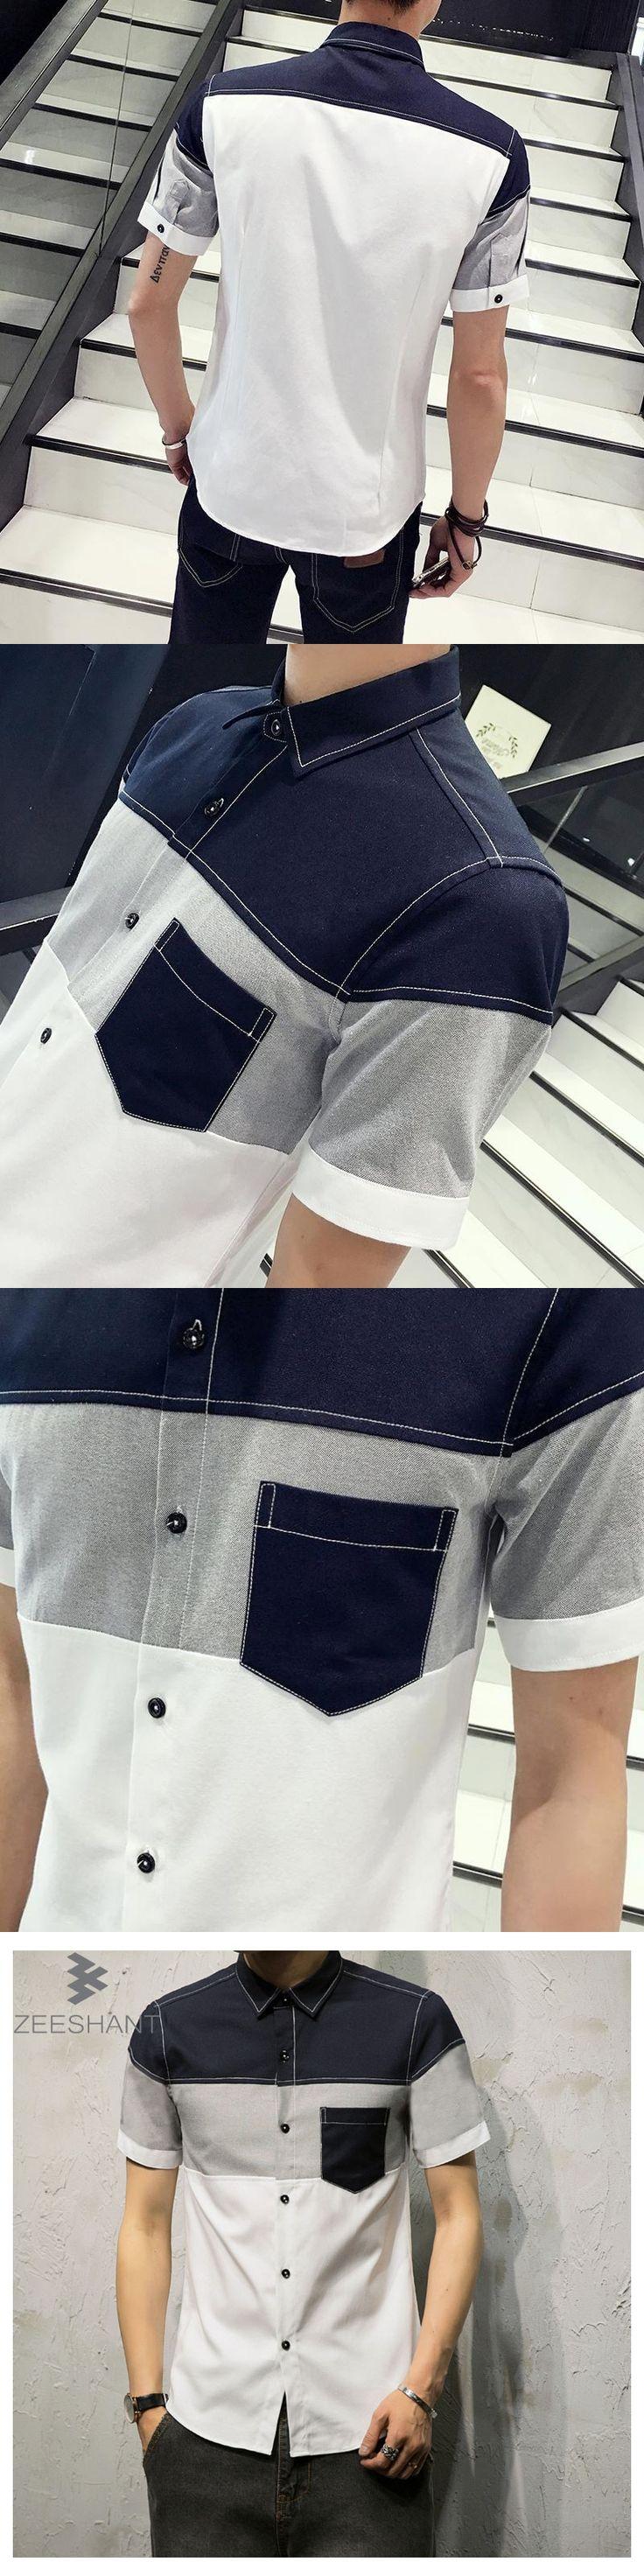 ZEESHANT 2017 Fashion New Mens Dress Shirts Patchwork XXXXXL Men Short Sleeve Shirt Camisa Masculina in Men's Tuxedo Shirts